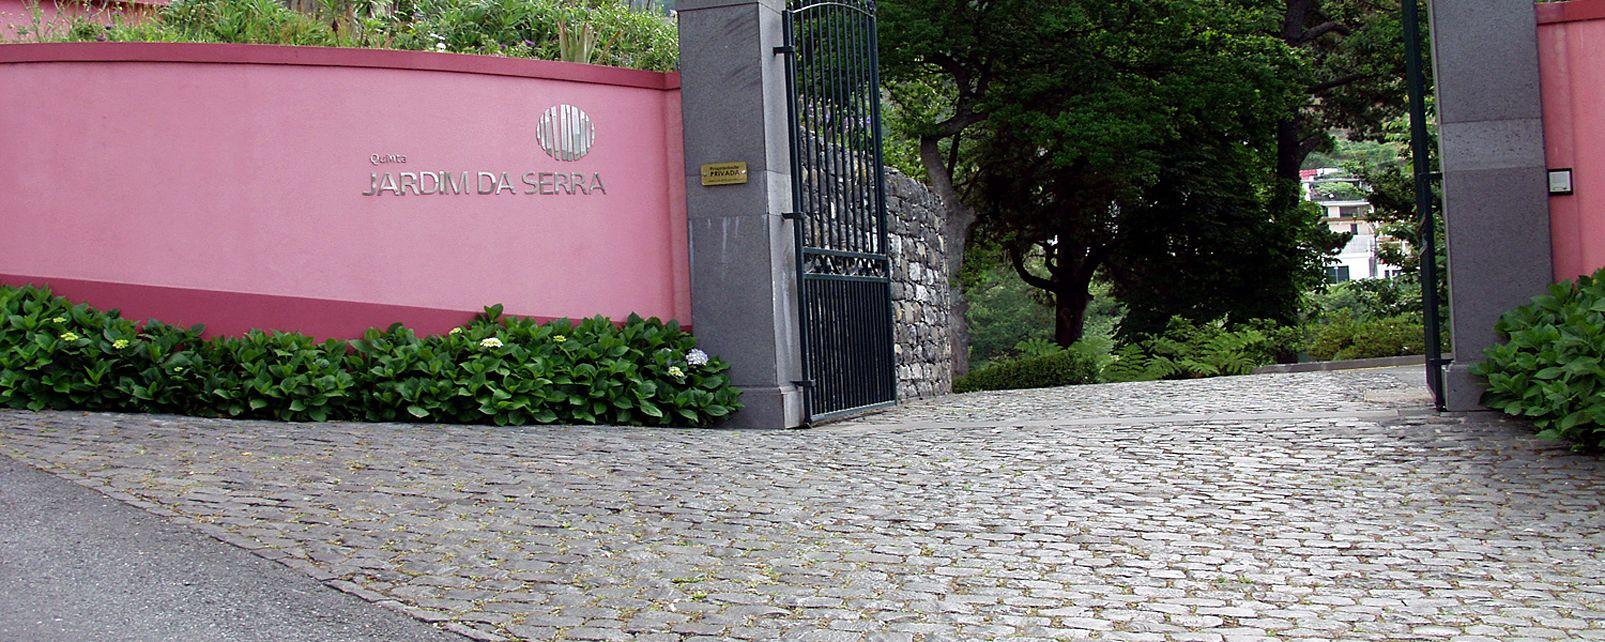 Hotel Quinta Jardim da Serra